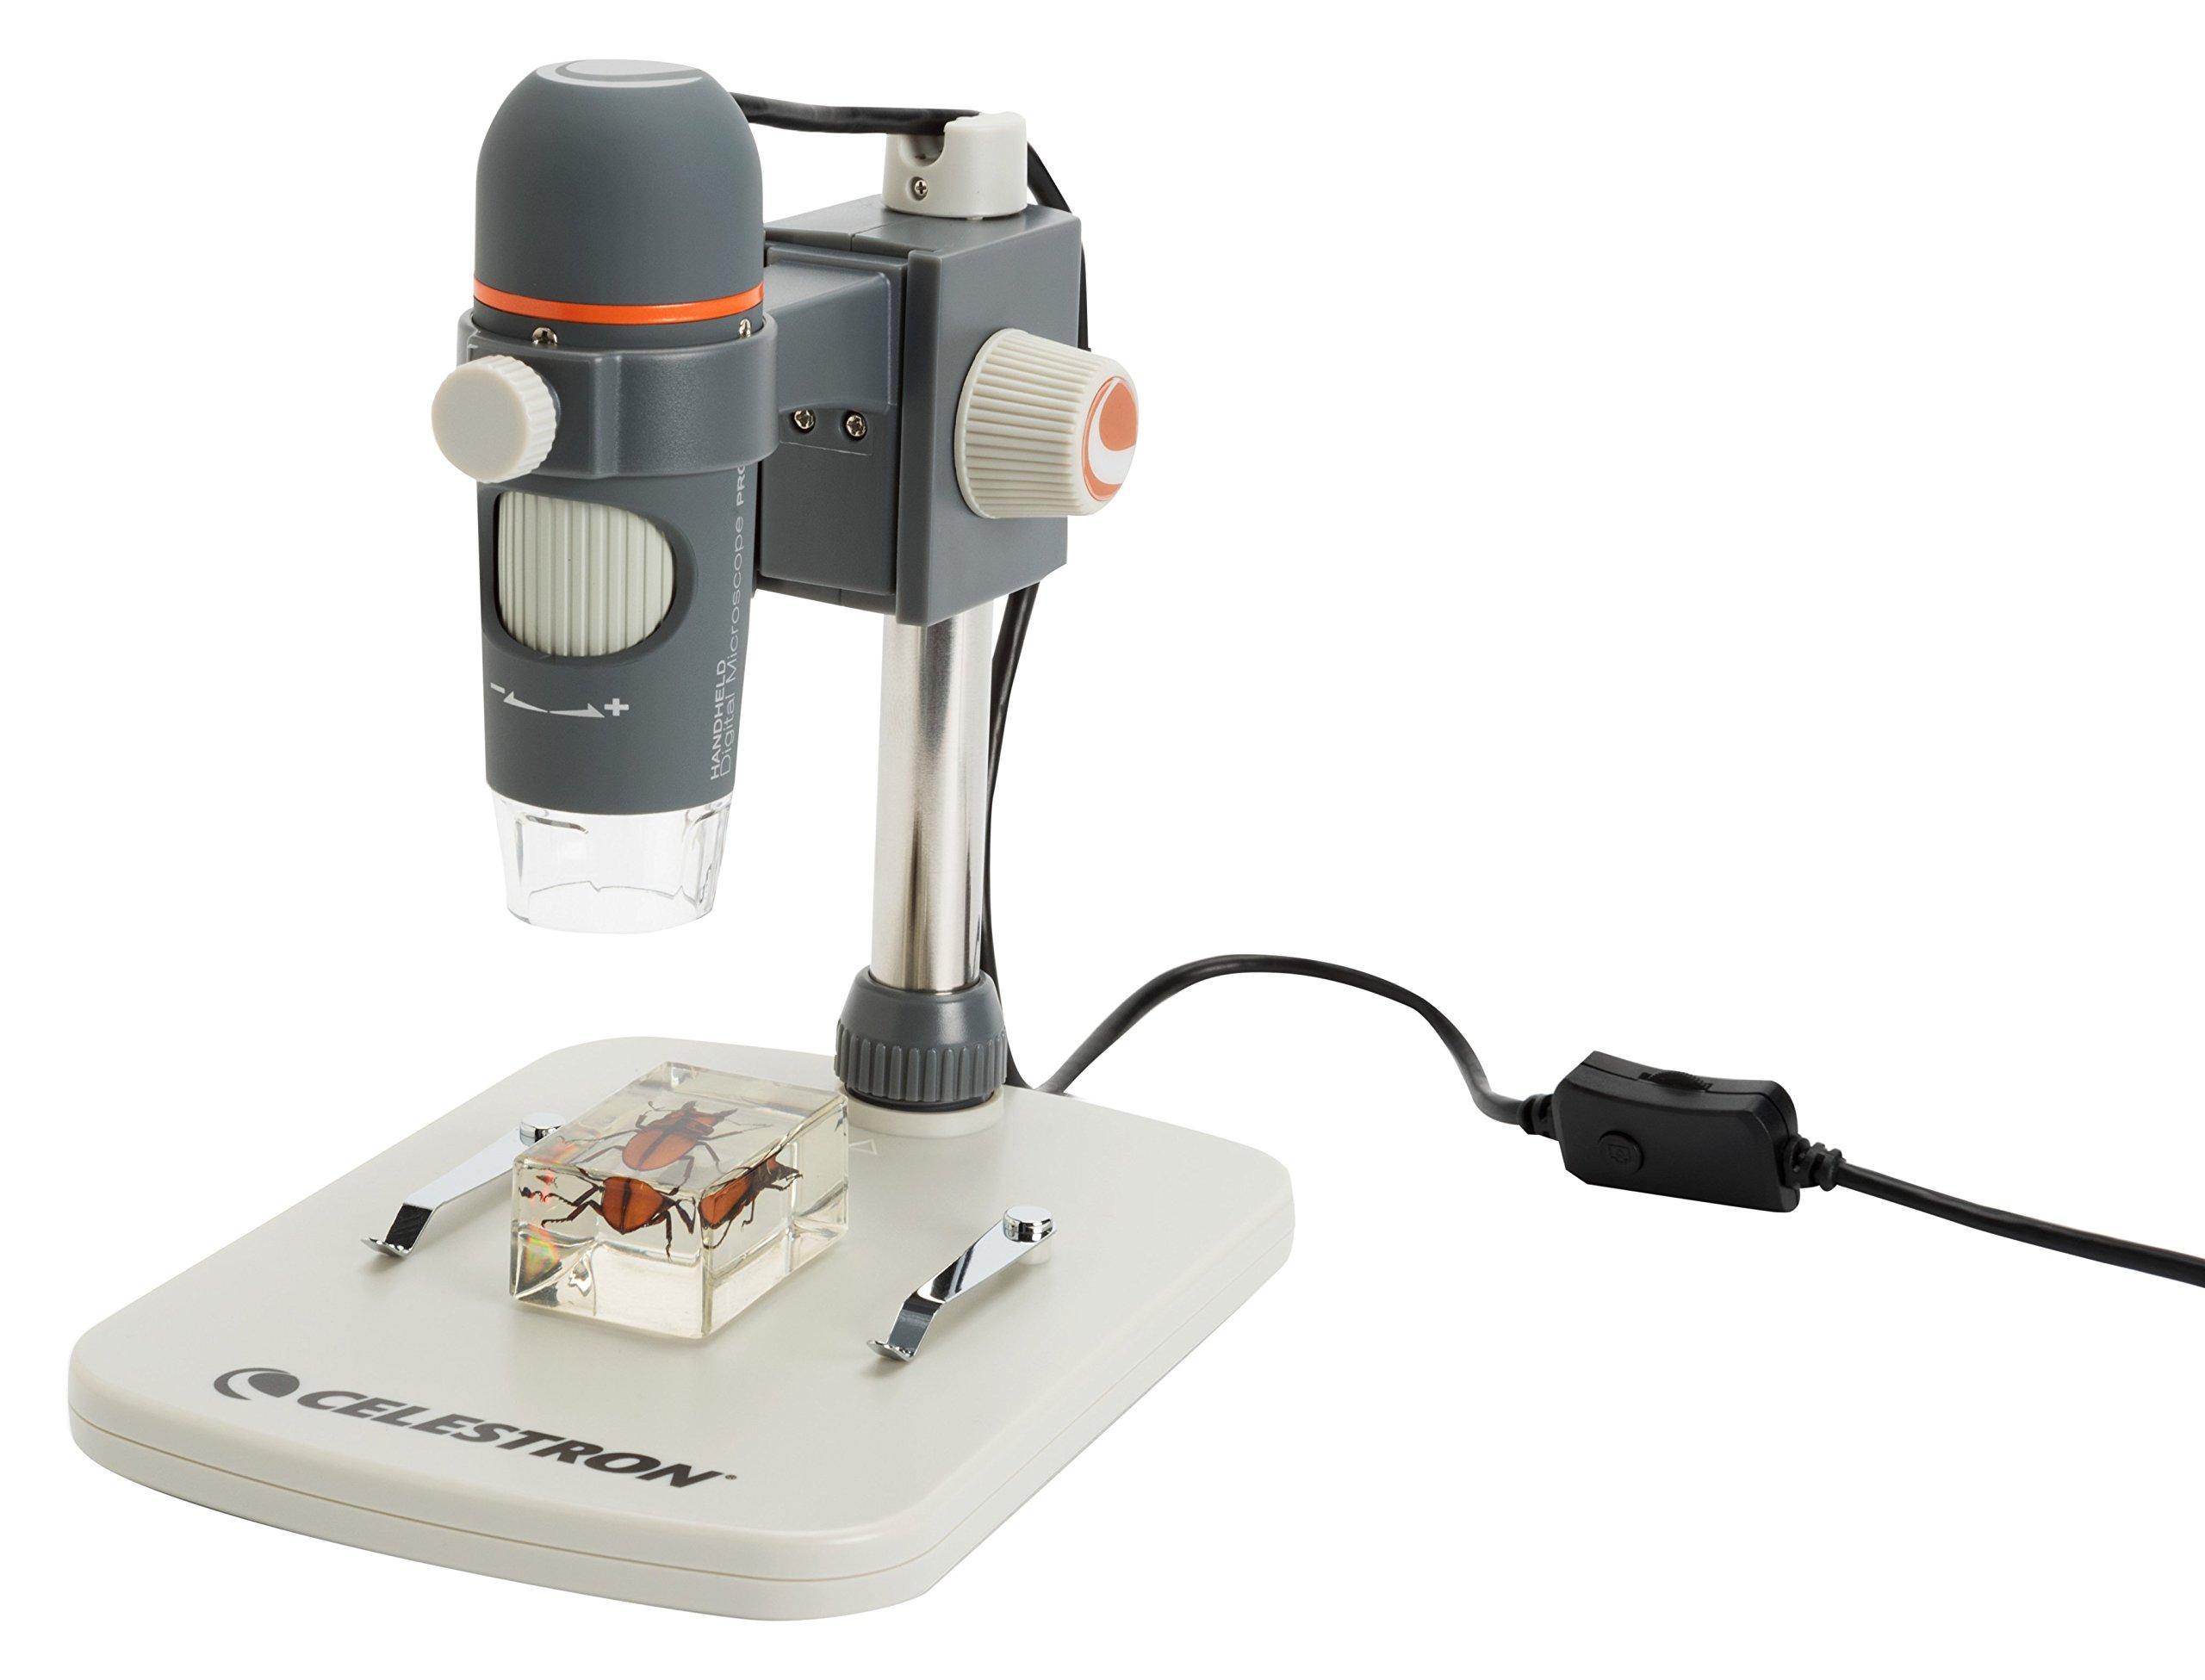 Dnt usb microscope software download usb mikroskop dnt mio pixel